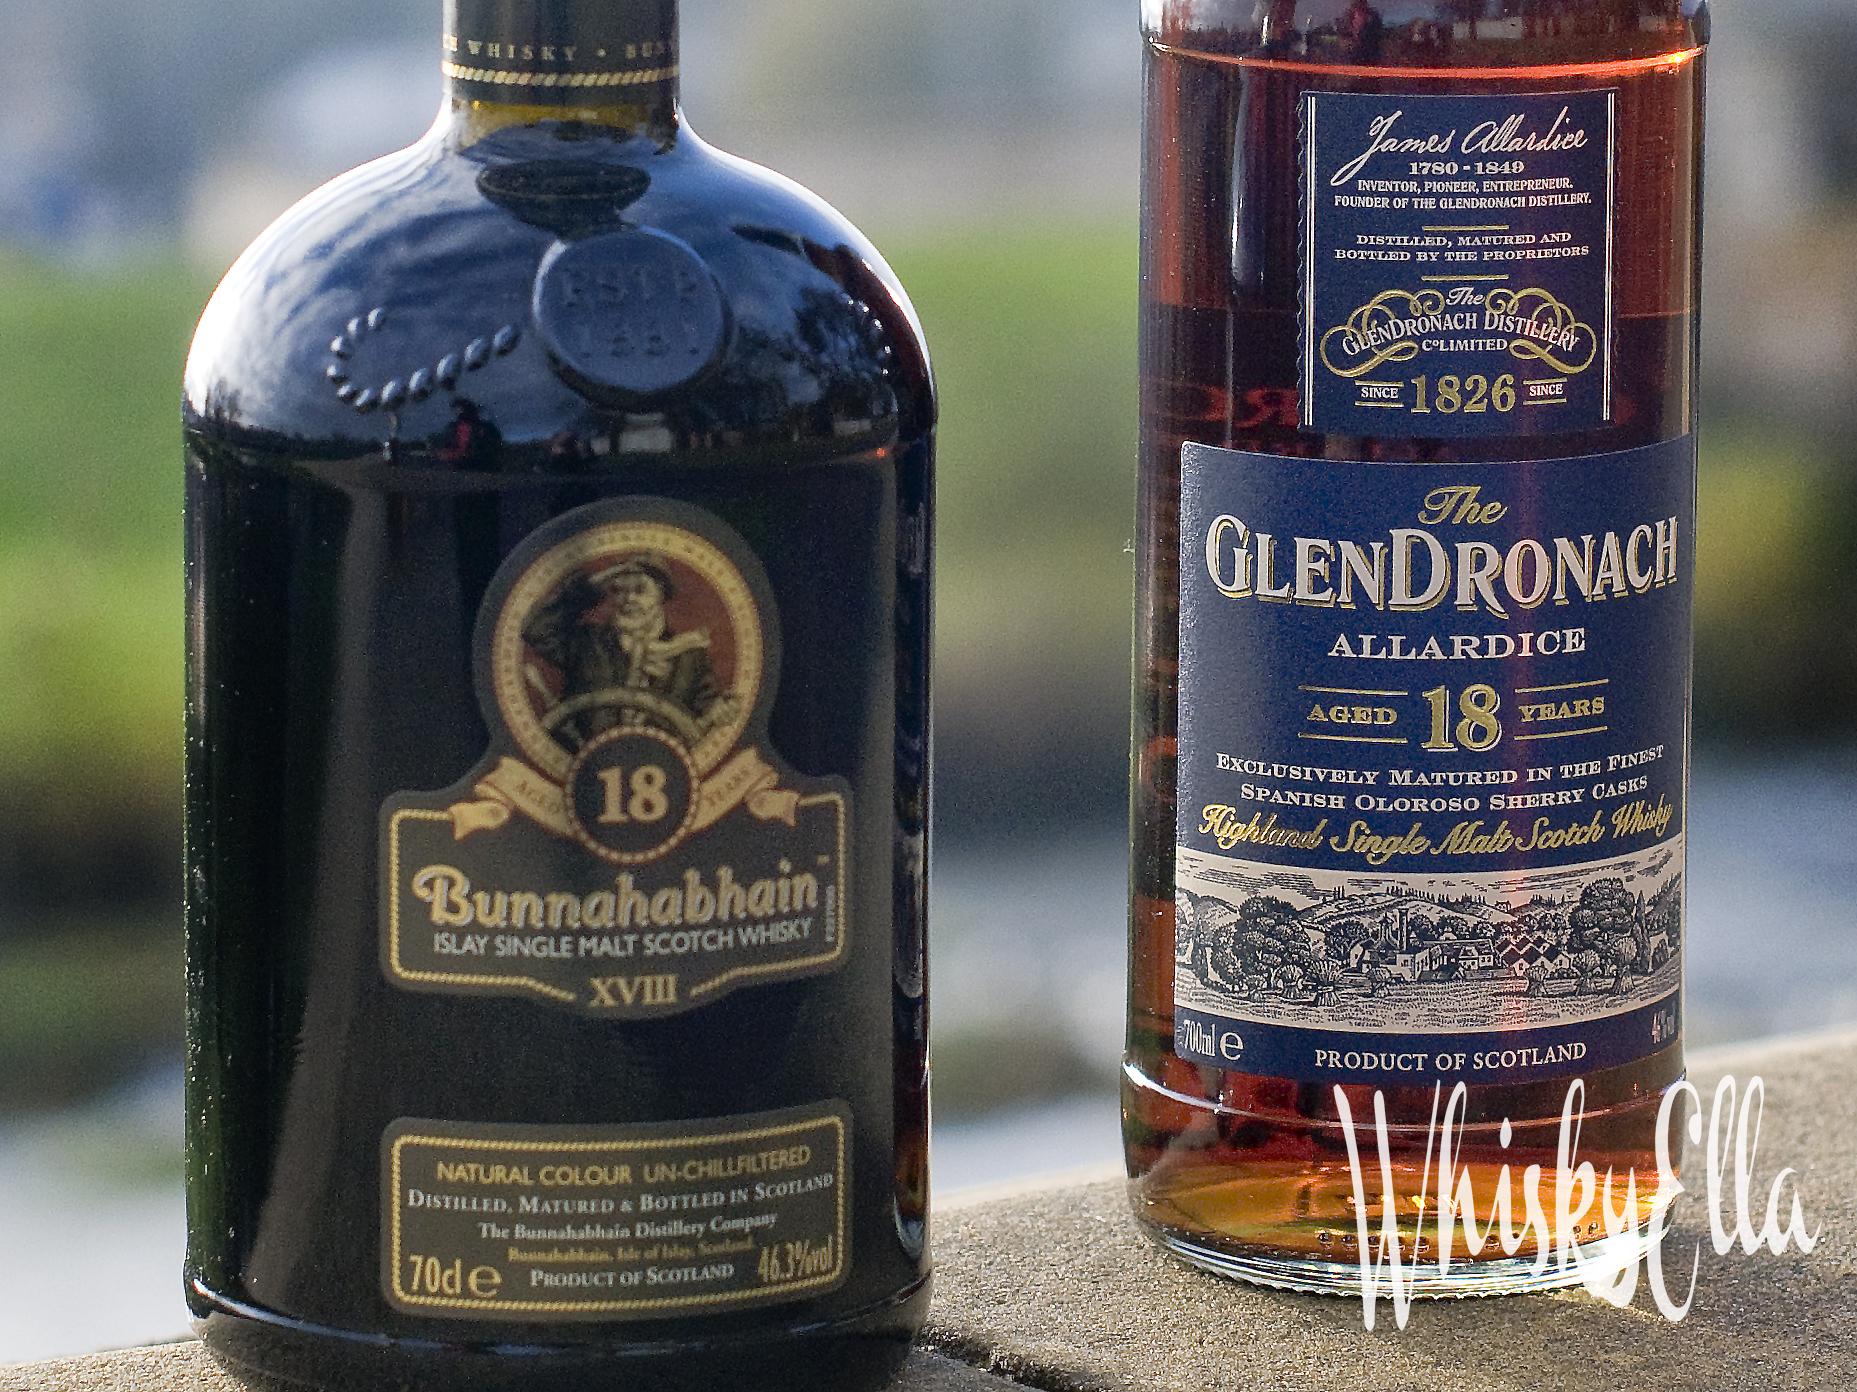 Nasza recenzja GlenDronach 18 yo Allardice vs Bunnahabhain 18 yo #90